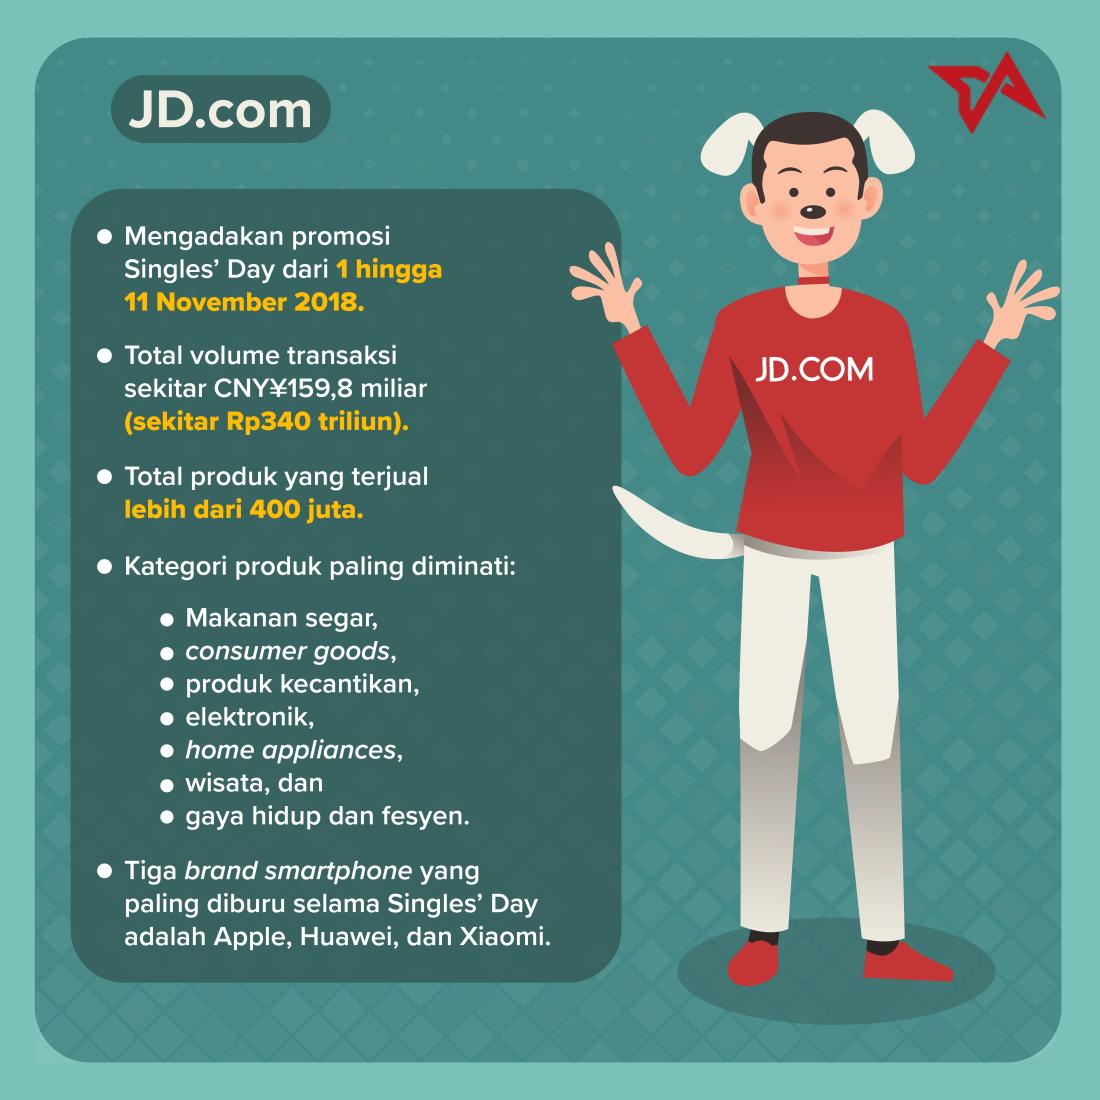 11.11 - Infografik JD.com